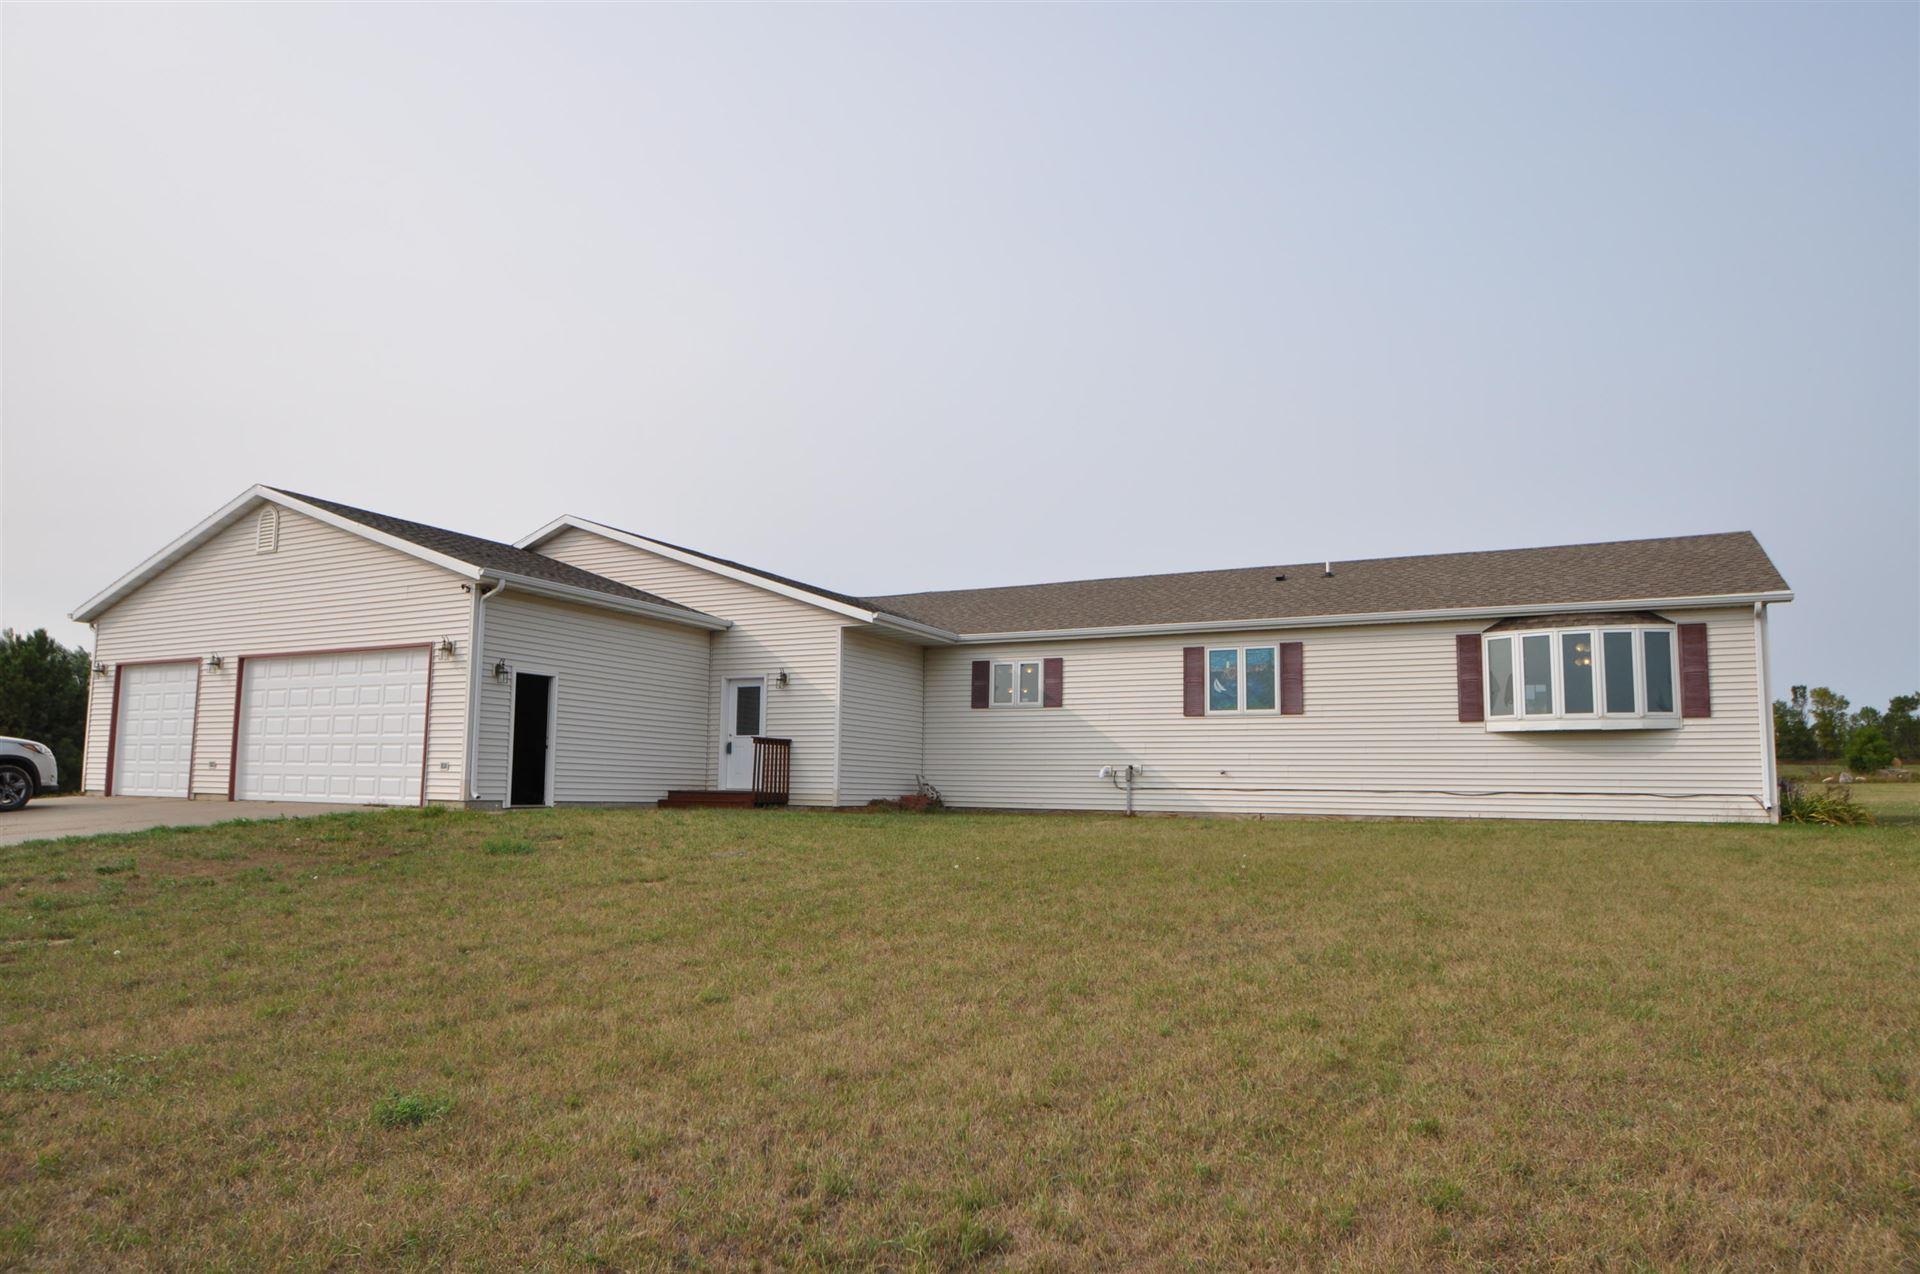 7612 Viking Drive, Bismarck, ND 58504 - #: 405567